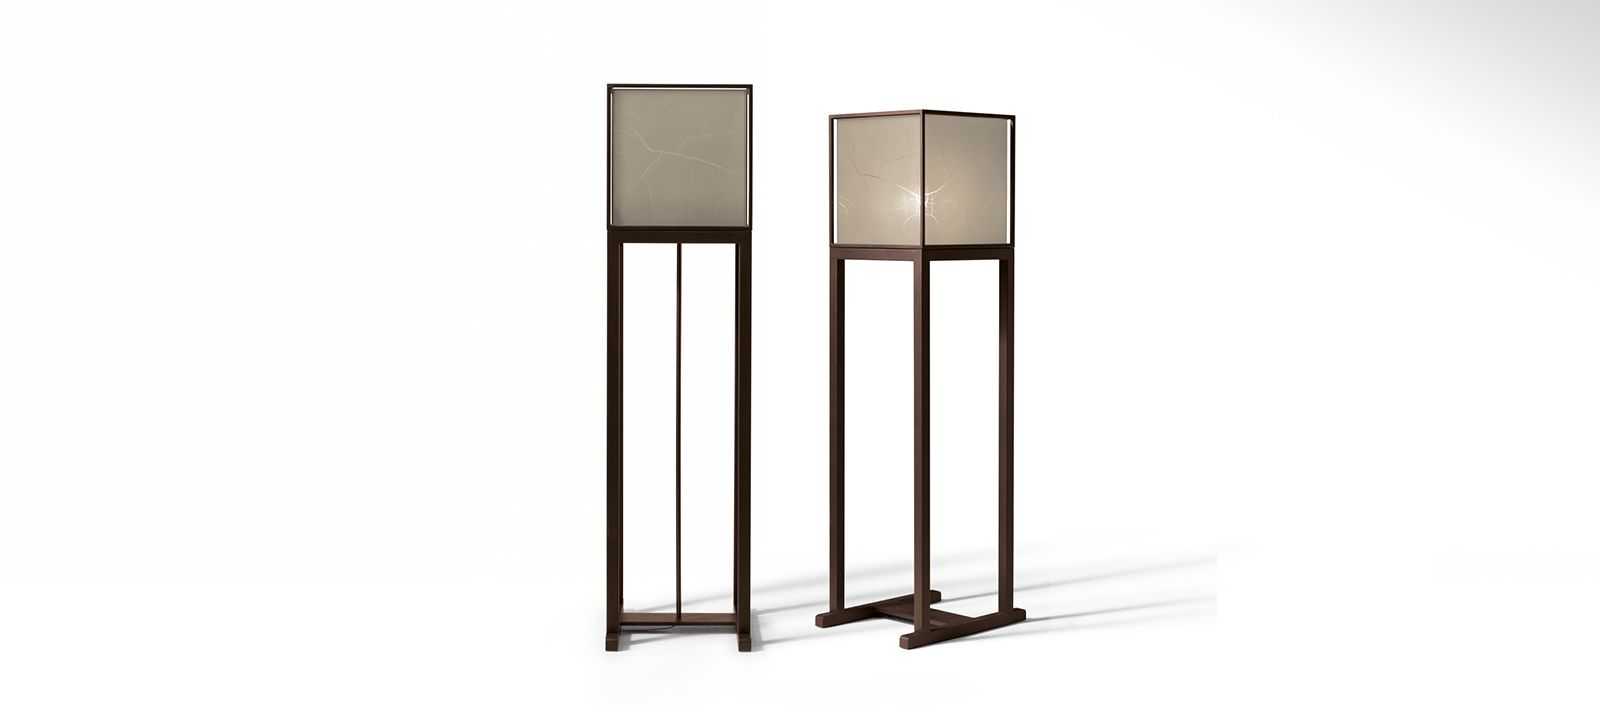 Giorgetti   Lighting/Floor Lamp   Pinterest   Floor lamp and Lights